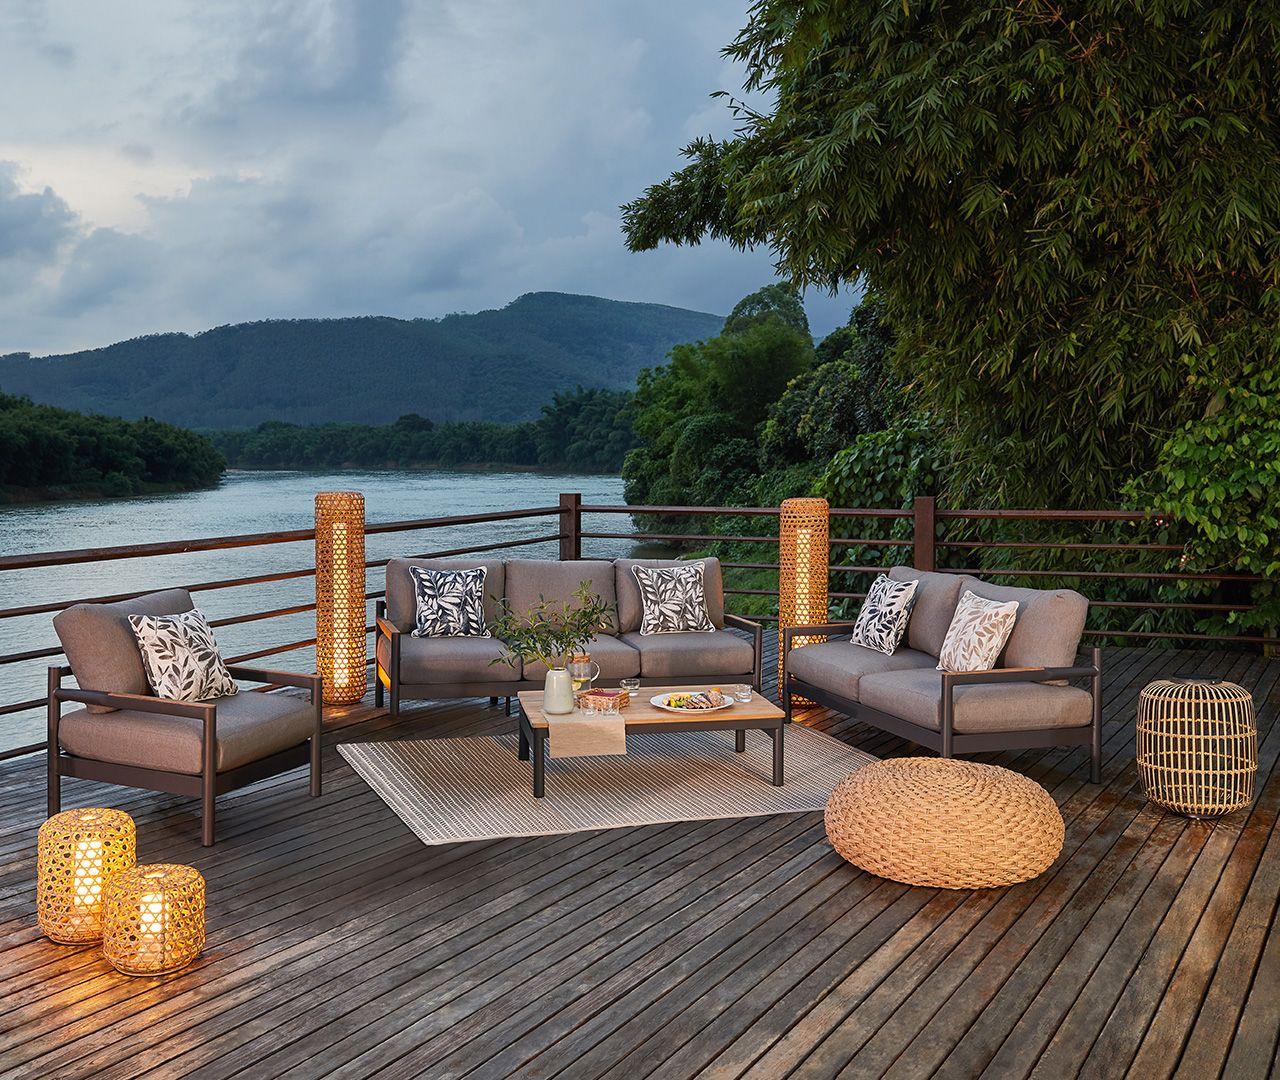 Gartenlounge Constania In 2020 Garten Lounge Im Freien Gartenmobel Sets